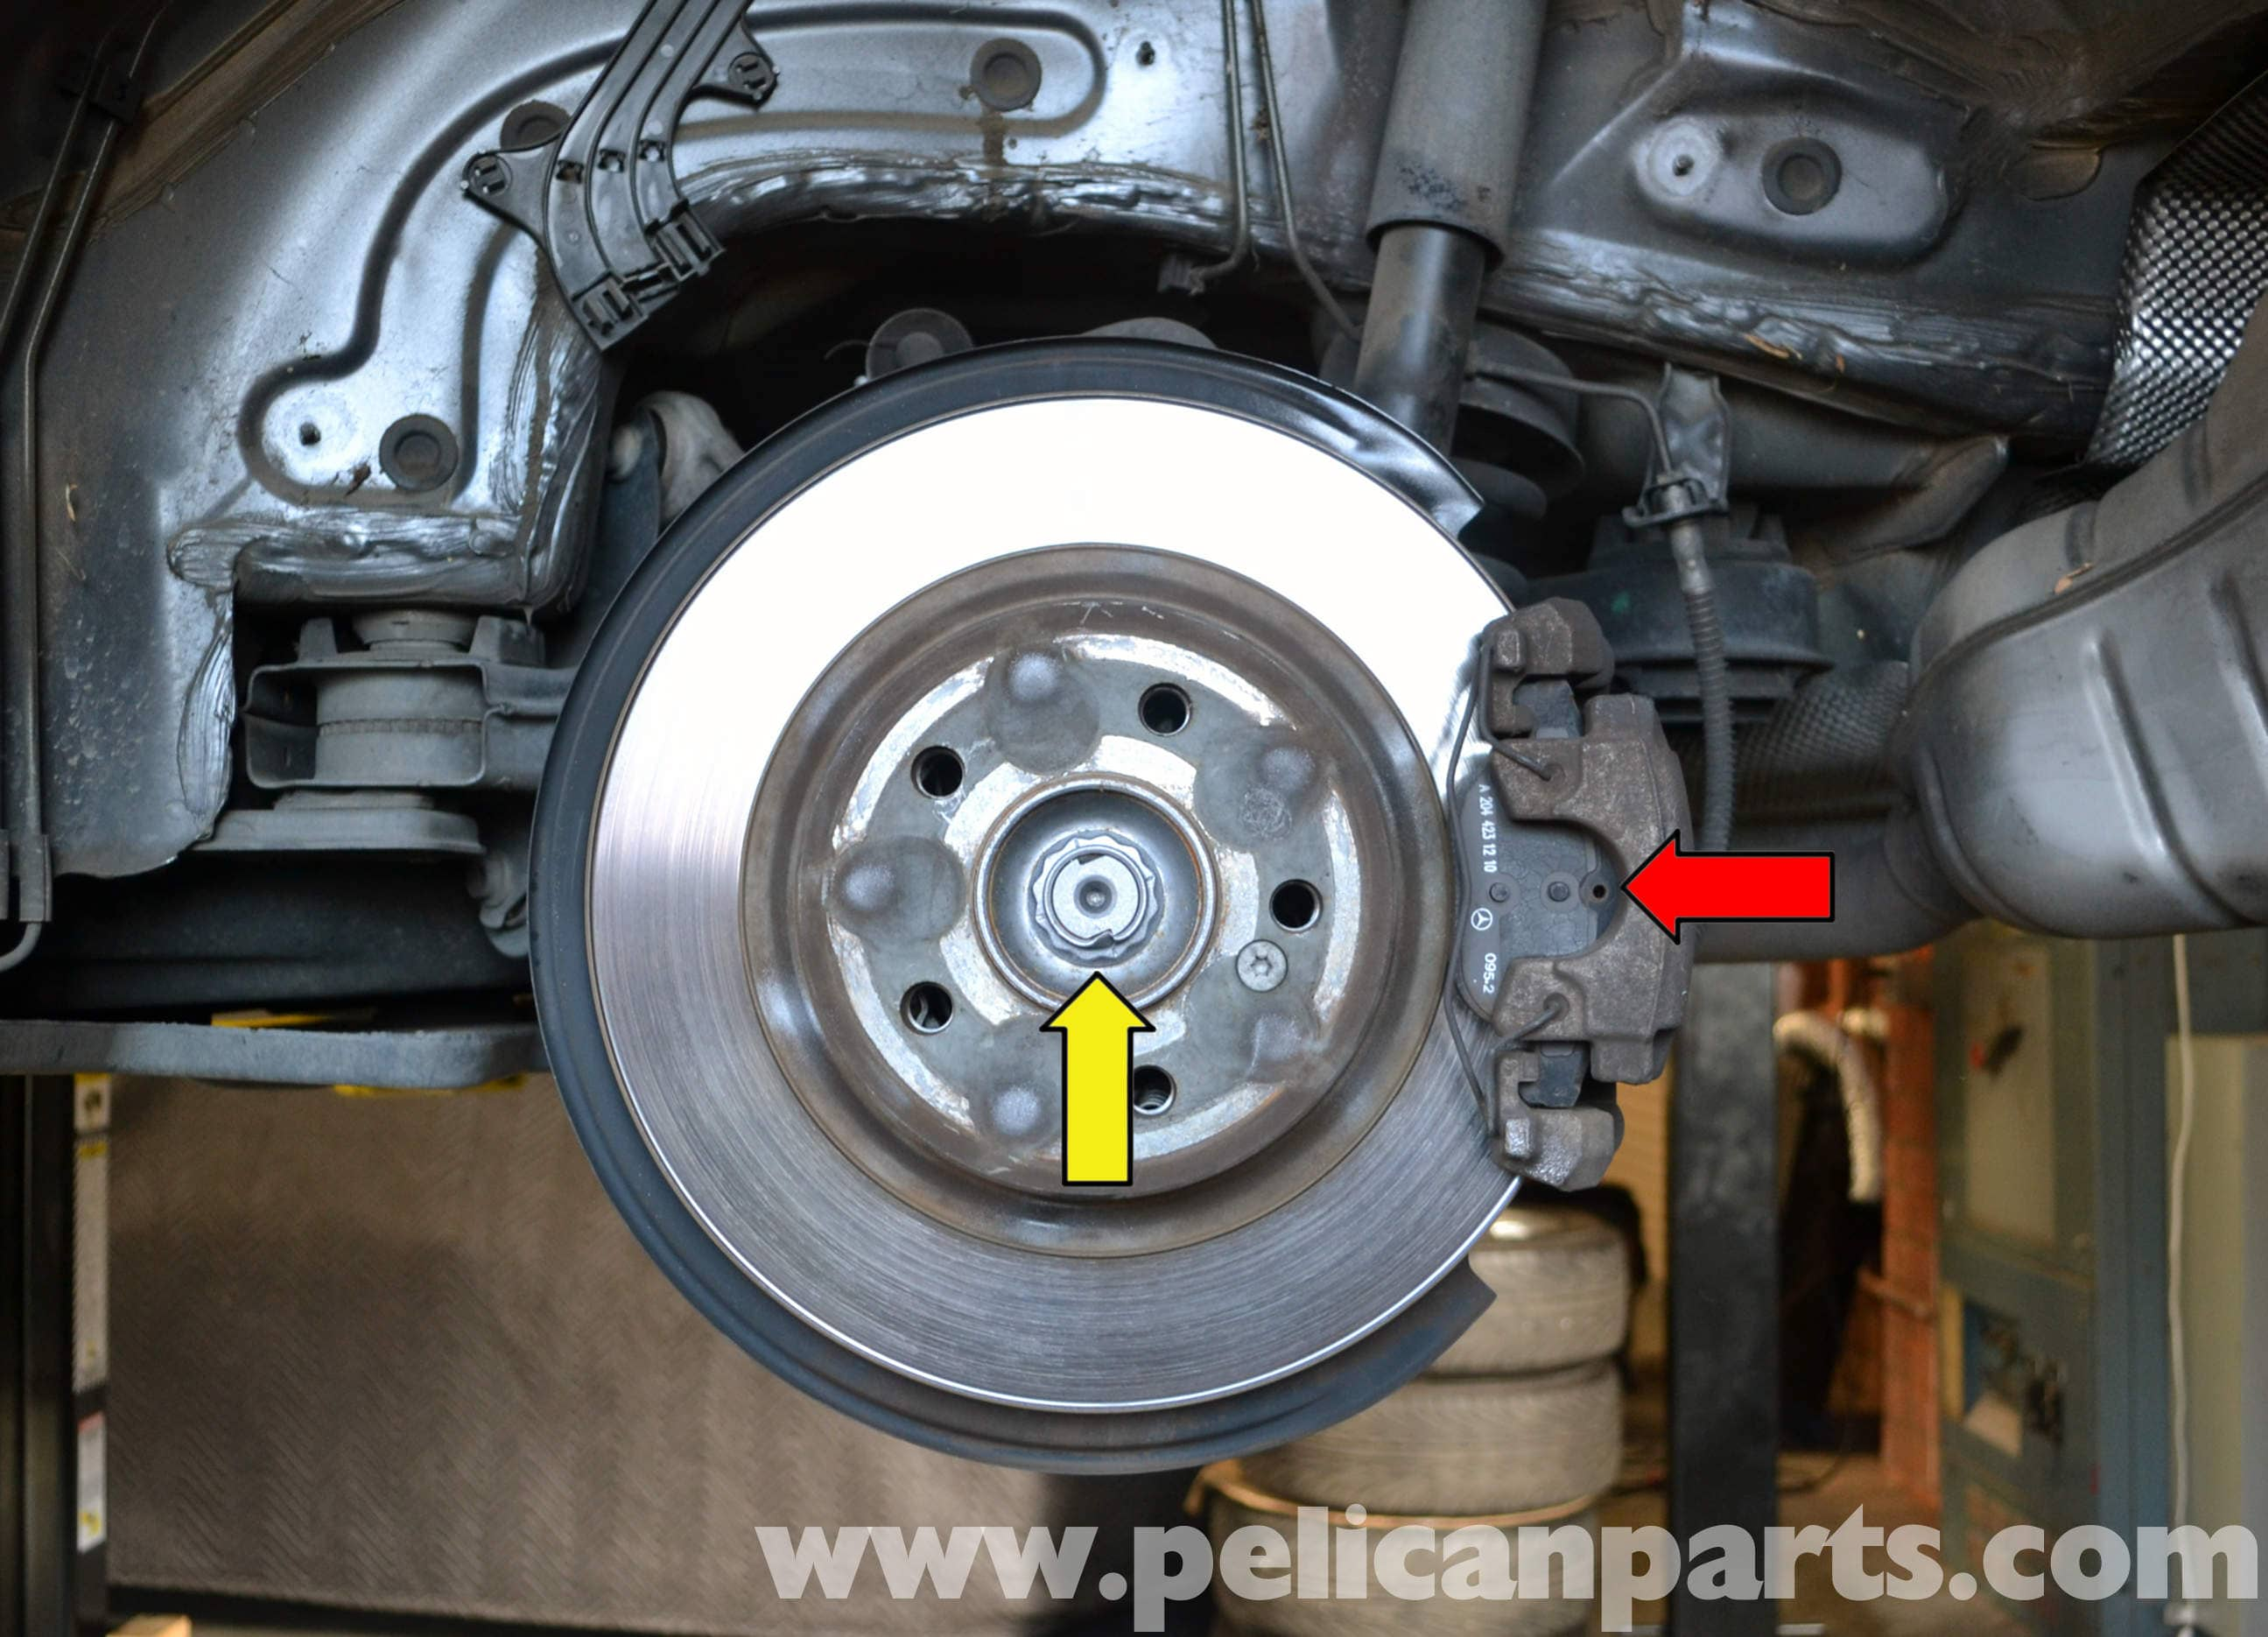 Mercedes-Benz W204 Axle Replacement - (2008-2014) C250, C300, C350